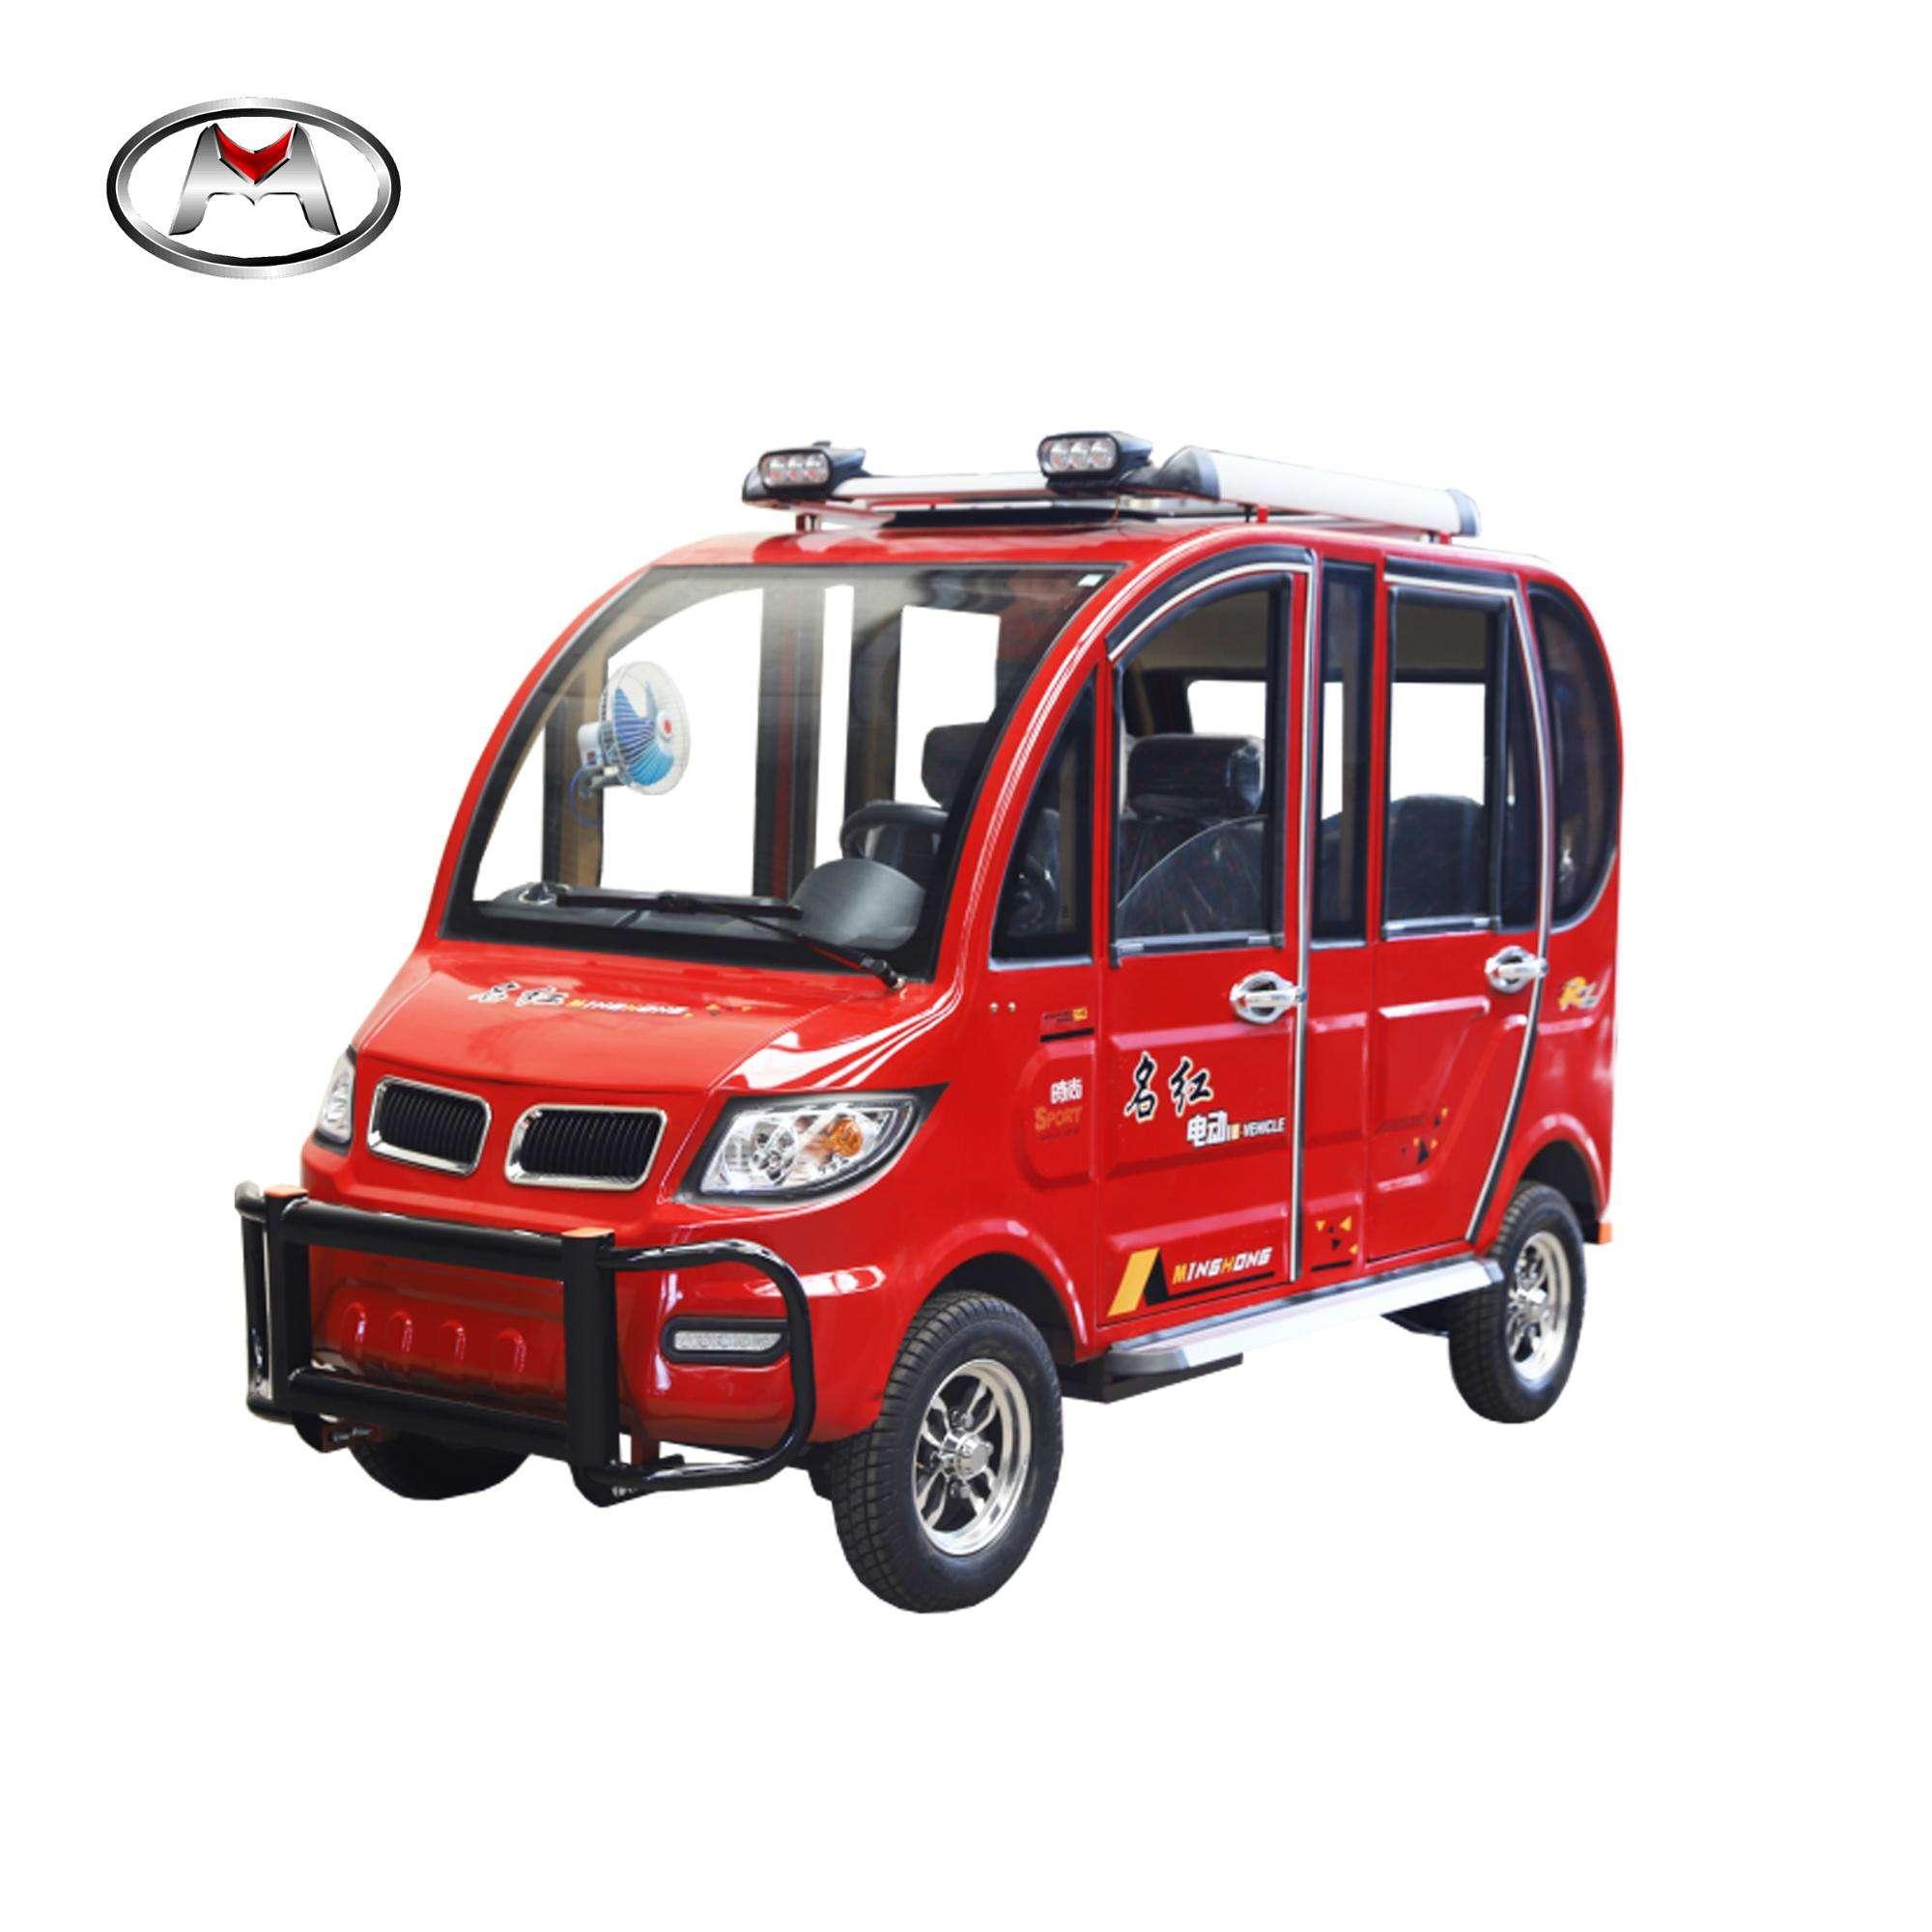 Chinês barato carros de quatro rodas elétrico veículo elétrico auto electrico para venda